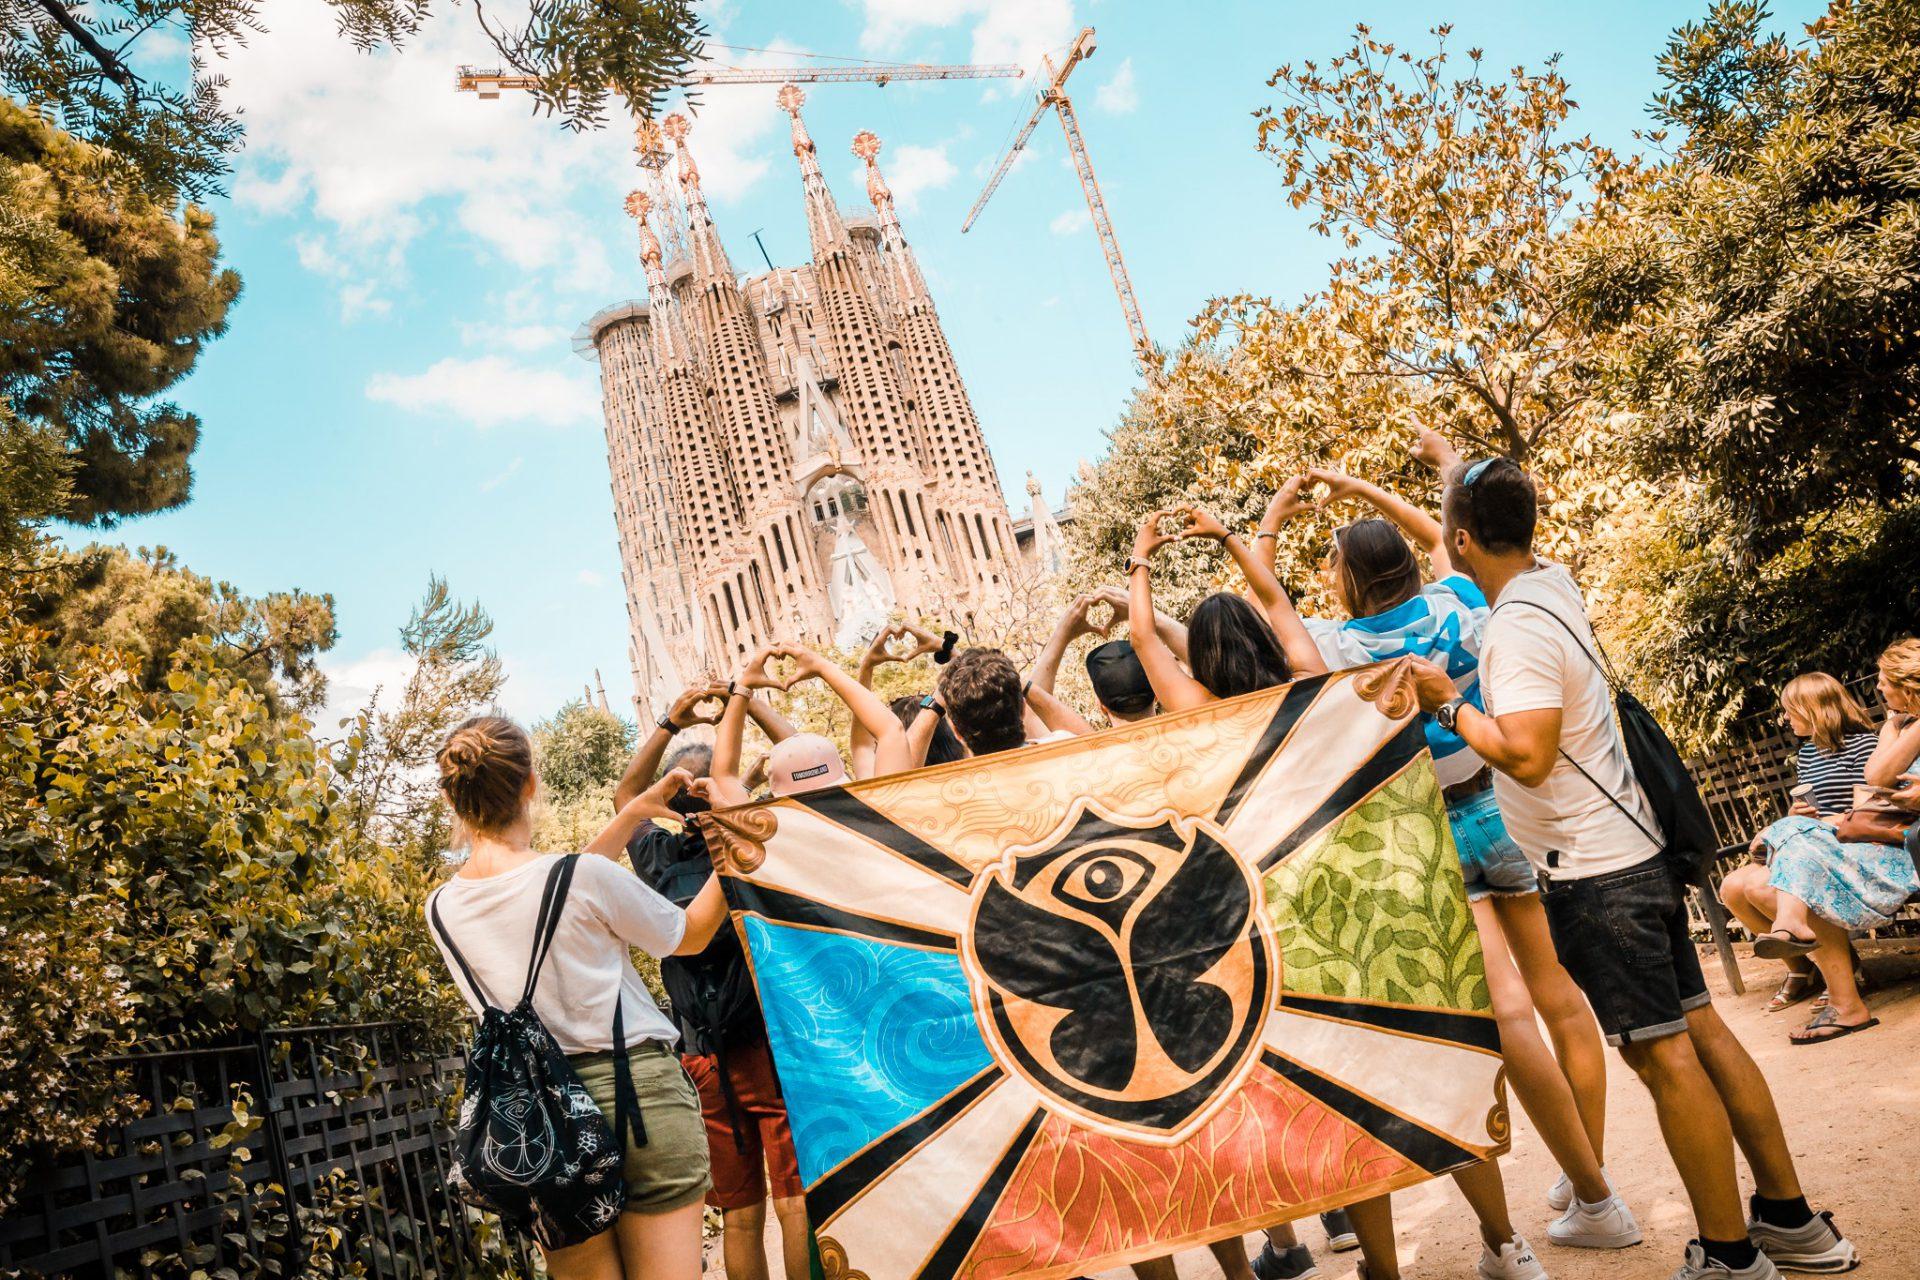 Sagrada Familia in Barcelona - Discover Europe by Tomorrowland